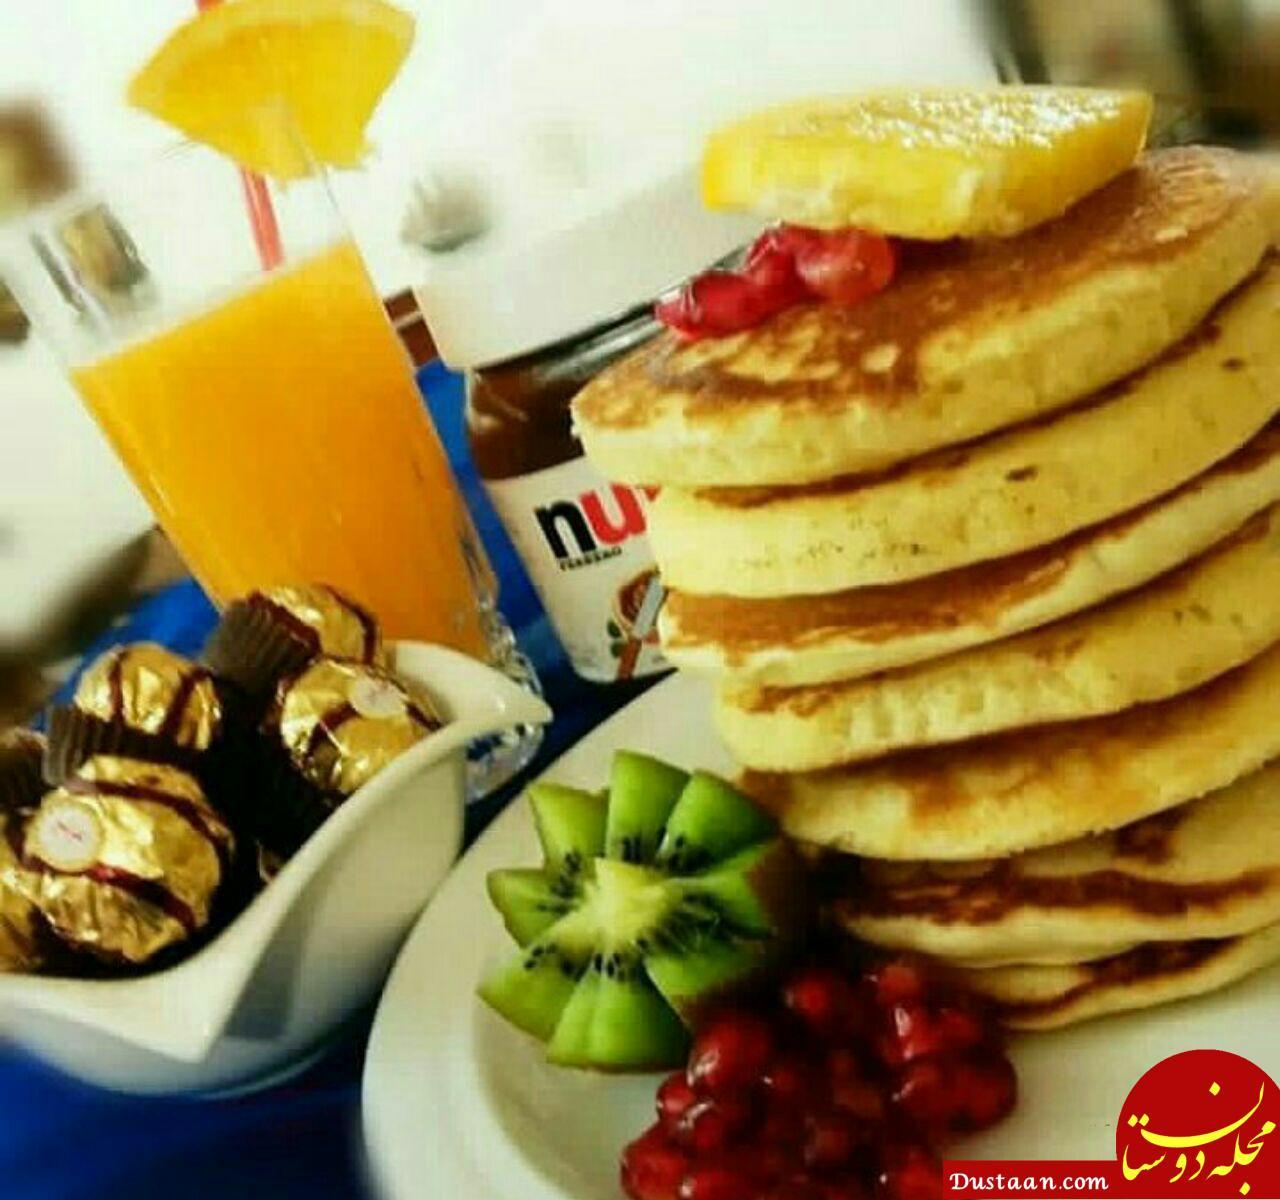 www.dustaan.com طرز تهیه پنکیک صبحانه ؛ صبحانه خوشمزه